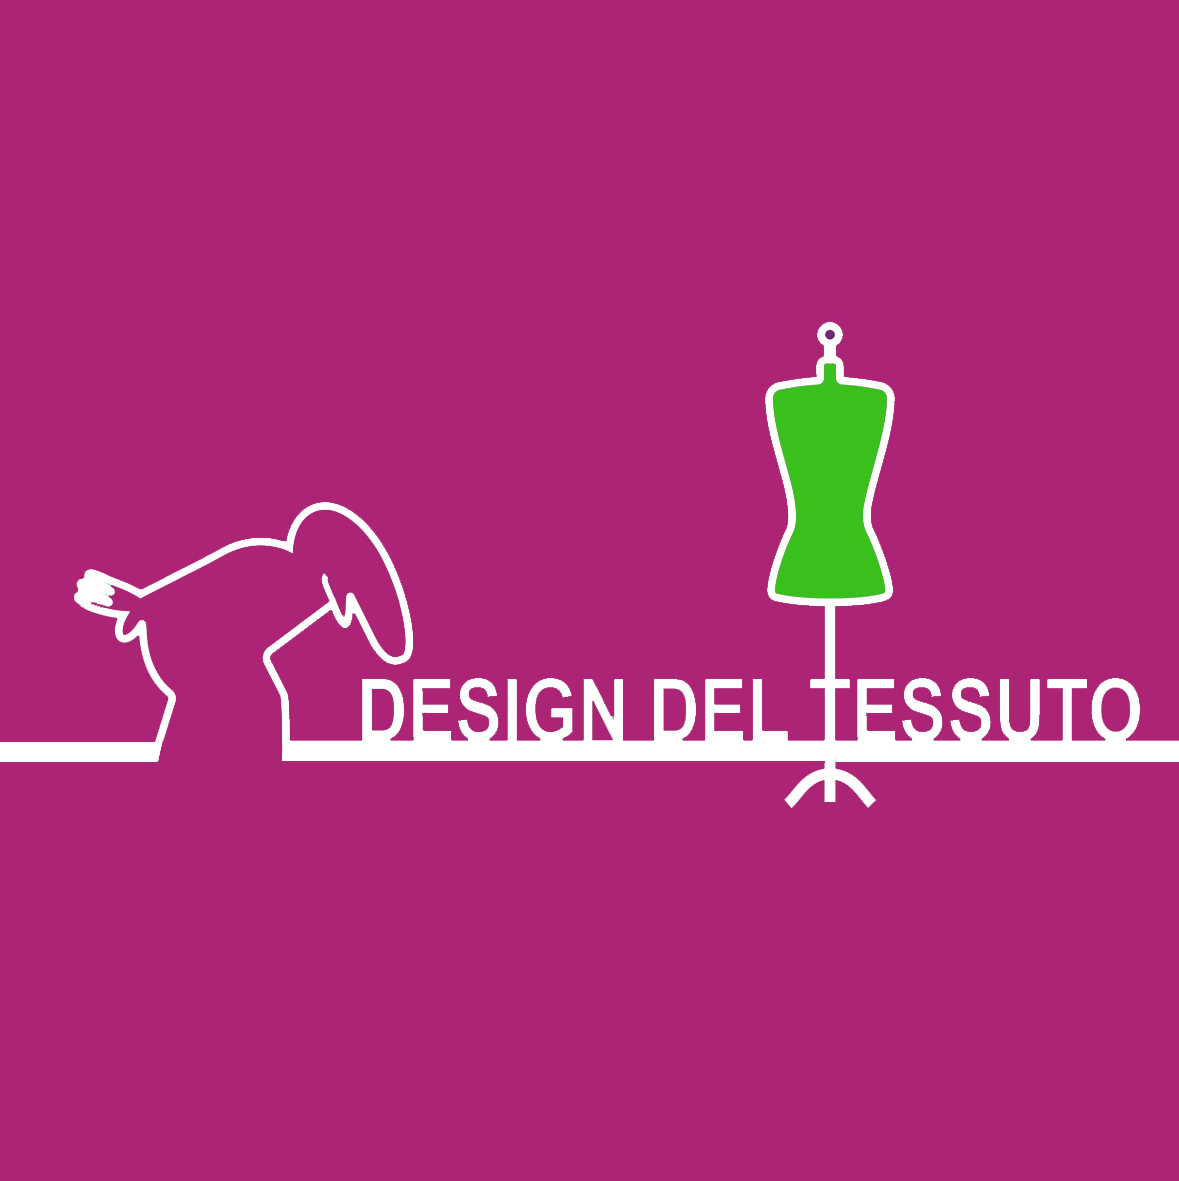 designe del tessuto Fk